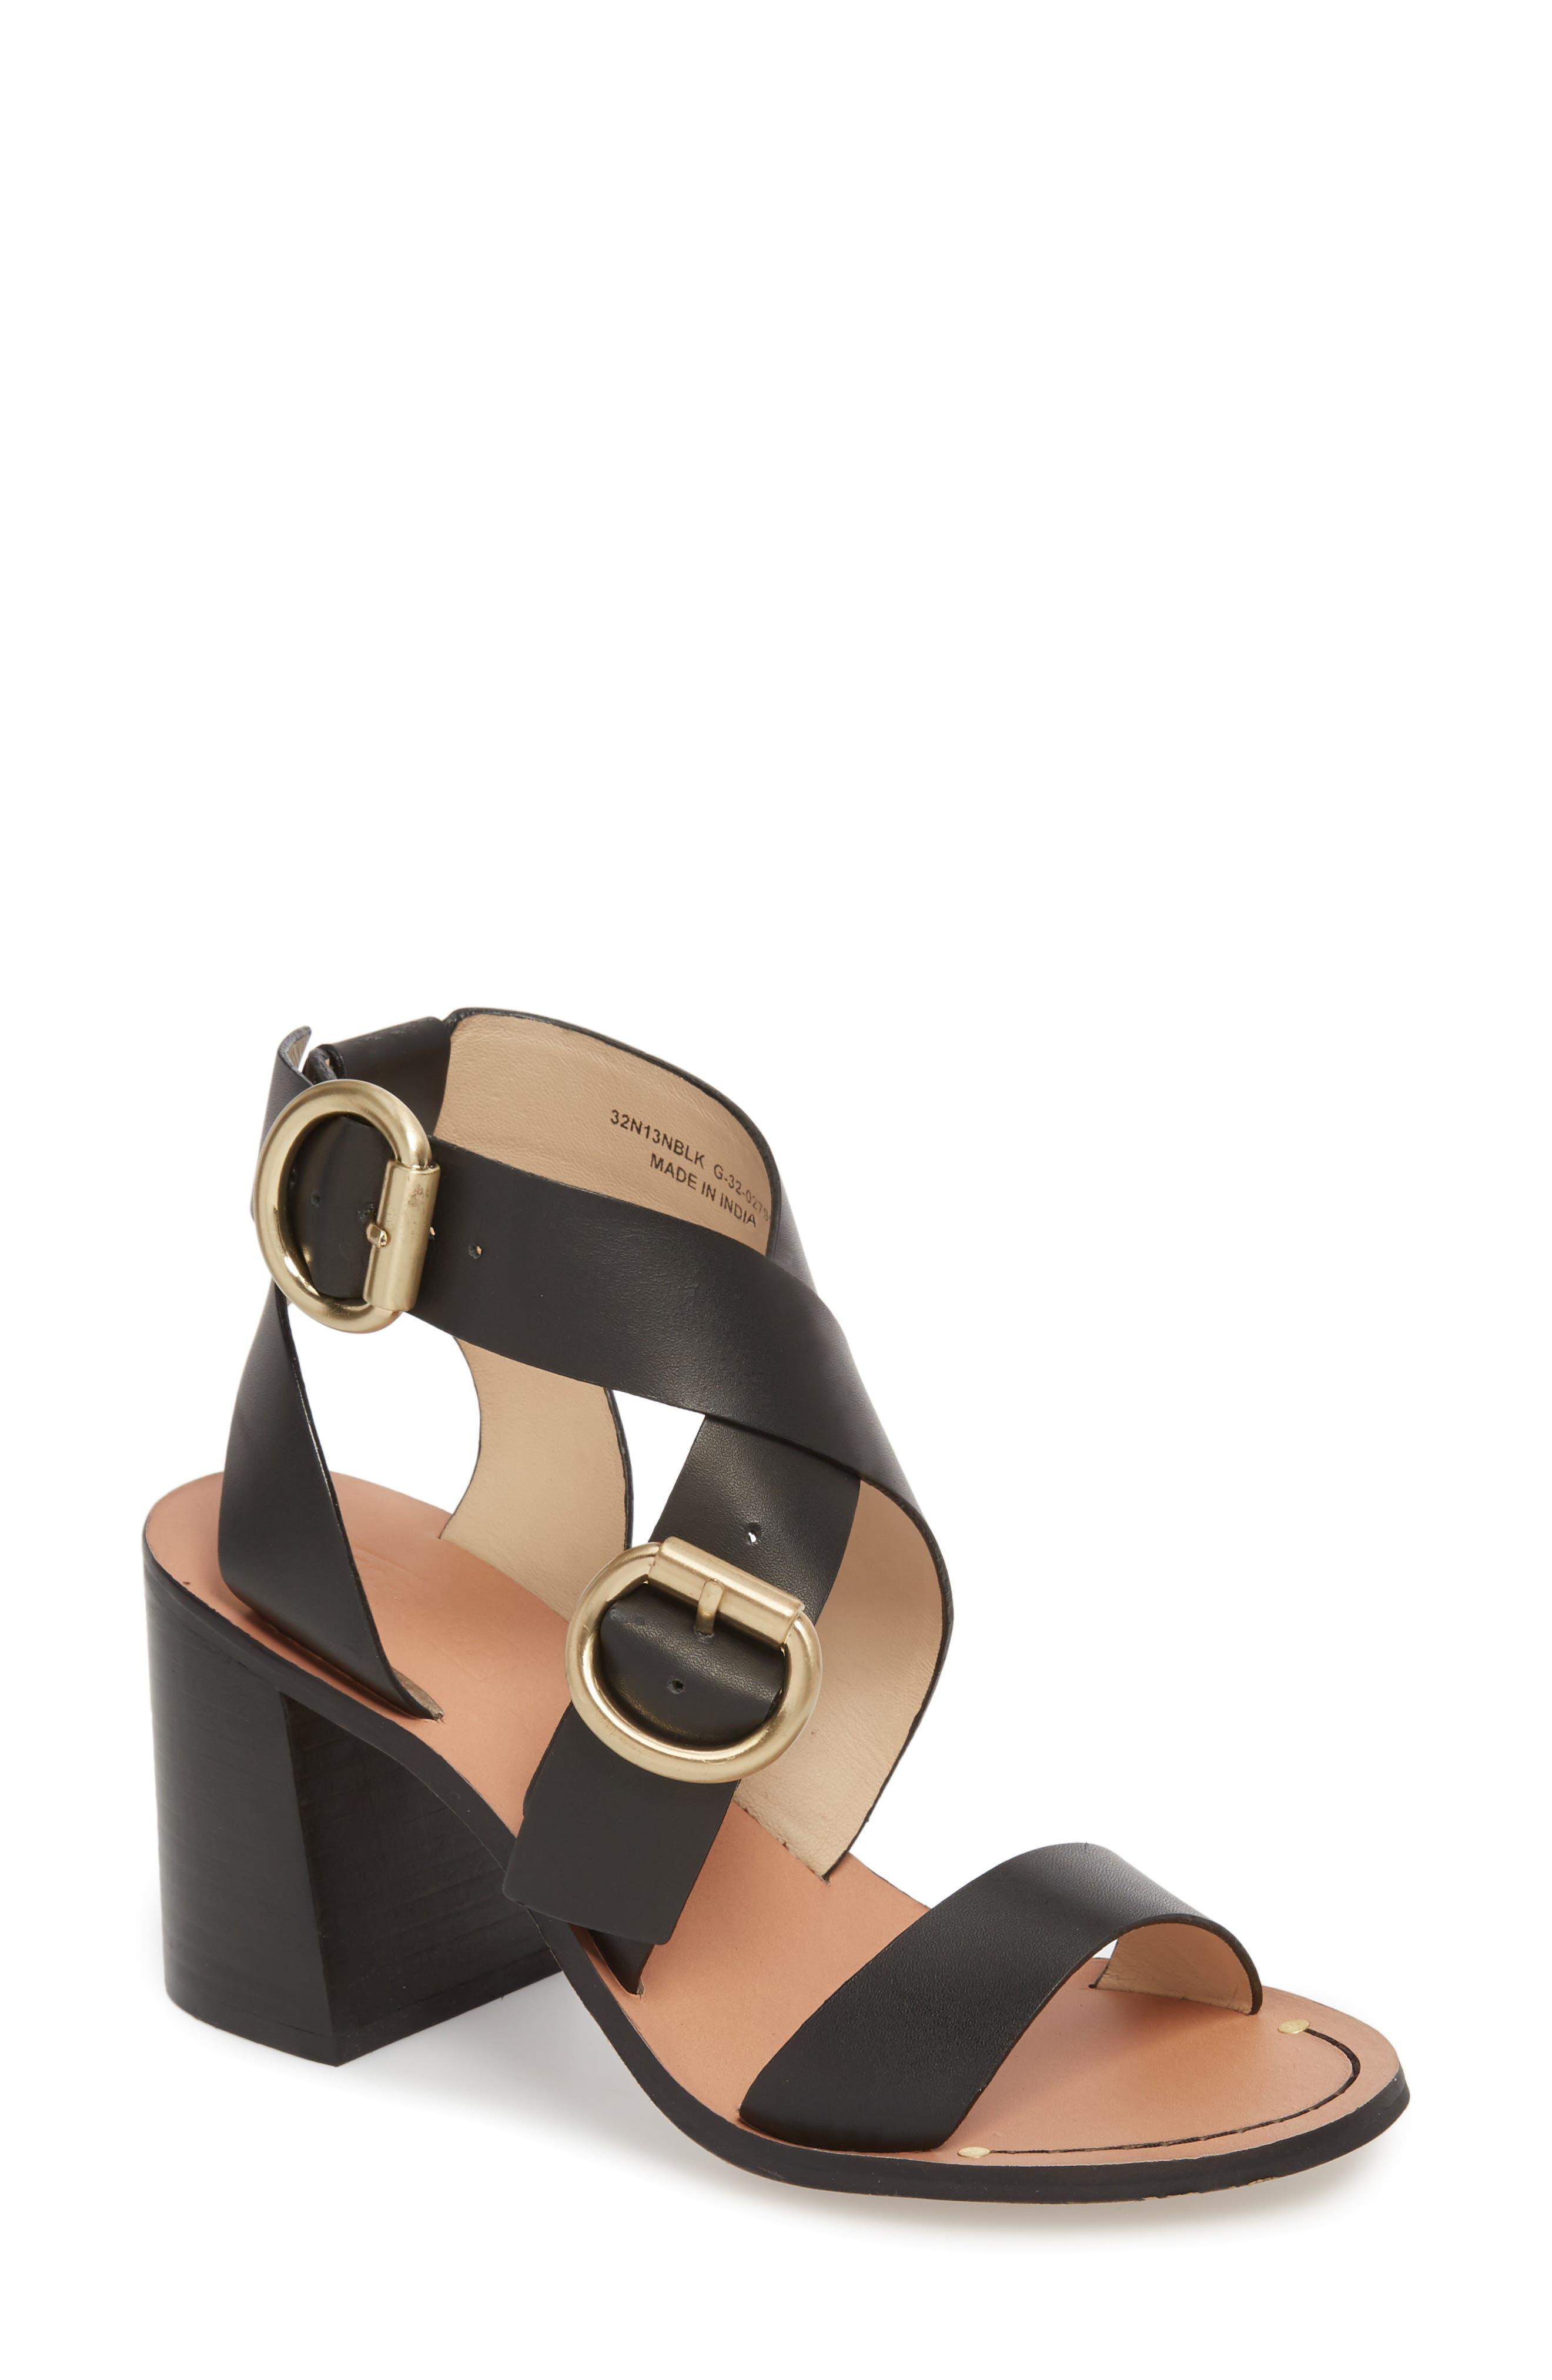 Natalie Buckled Cross Strap Sandal,                         Main,                         color, Black Multi